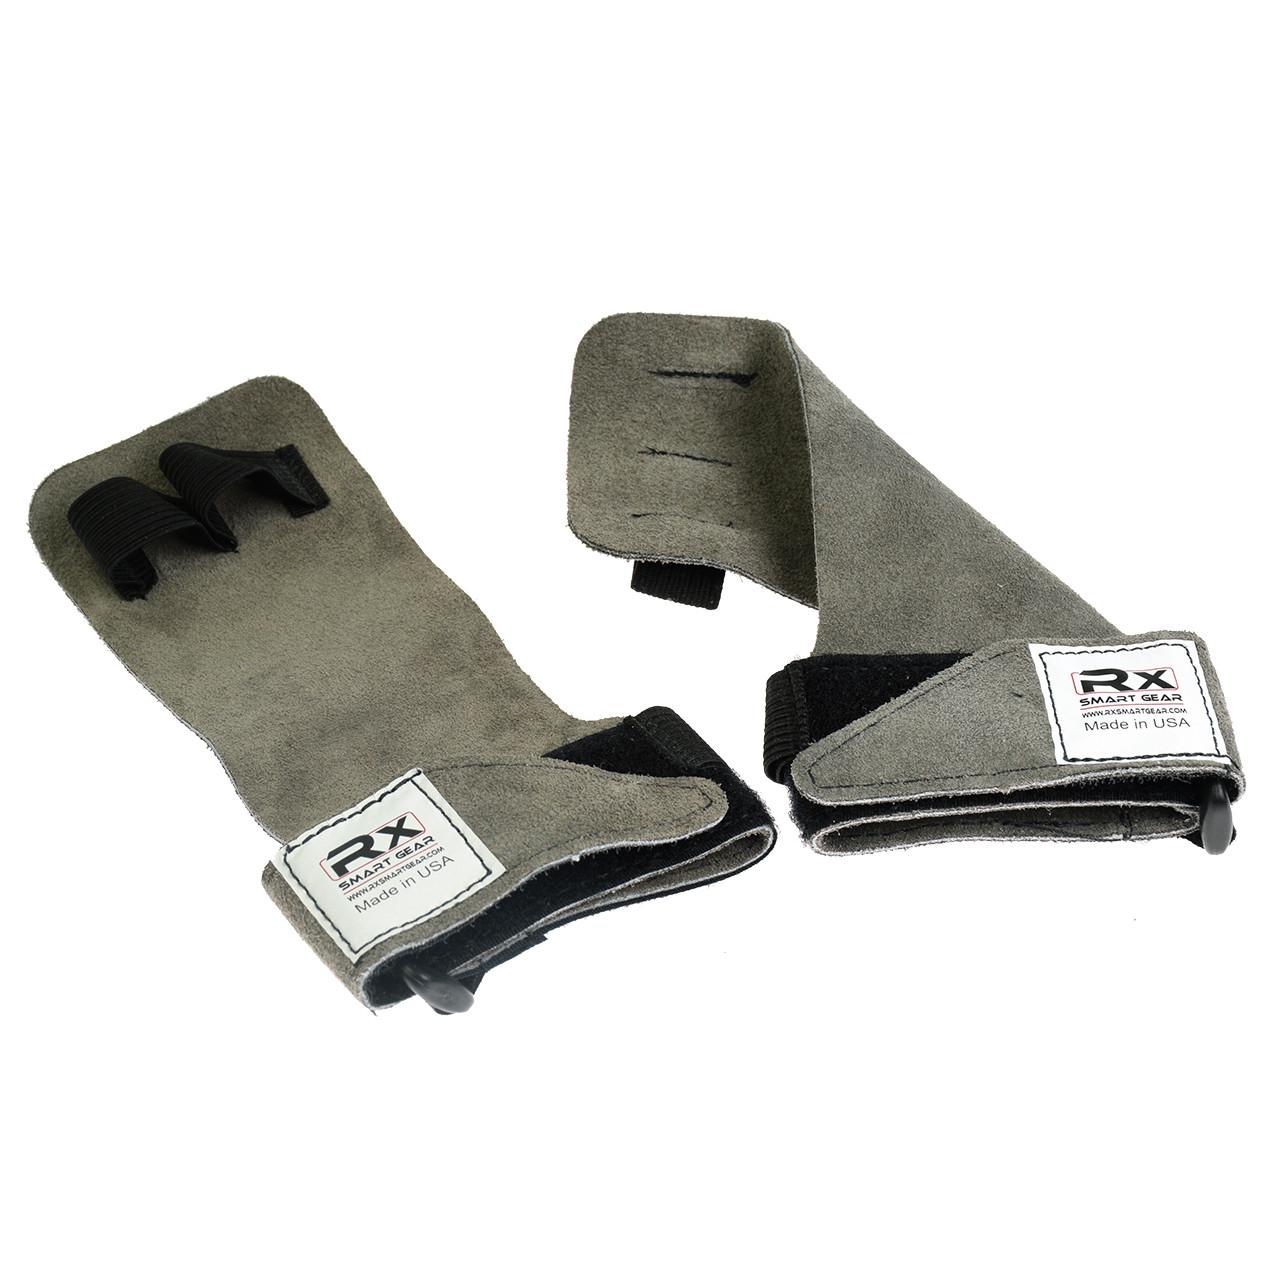 759cd736dd8 Rx Smart Grips. Price: $29.95. Gymnastic Grips